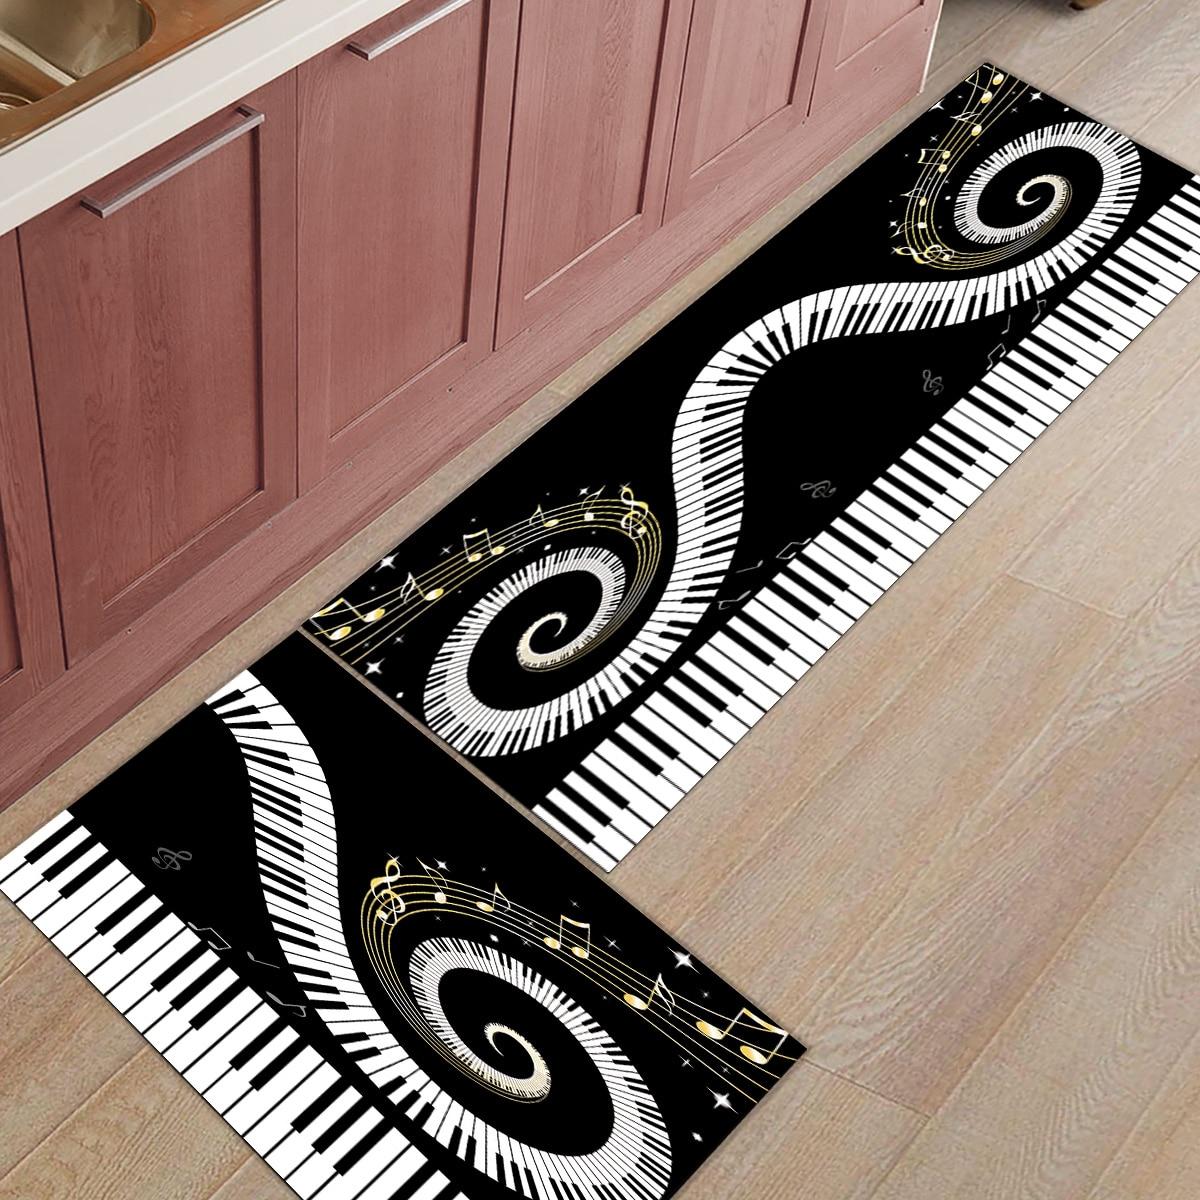 2Pcs/Set Piano Keys Staff Swirl Black White Kitchen Mat Modern Carpet Entrance Doormat Tapete Rugs Bedroom Mats Home Decor